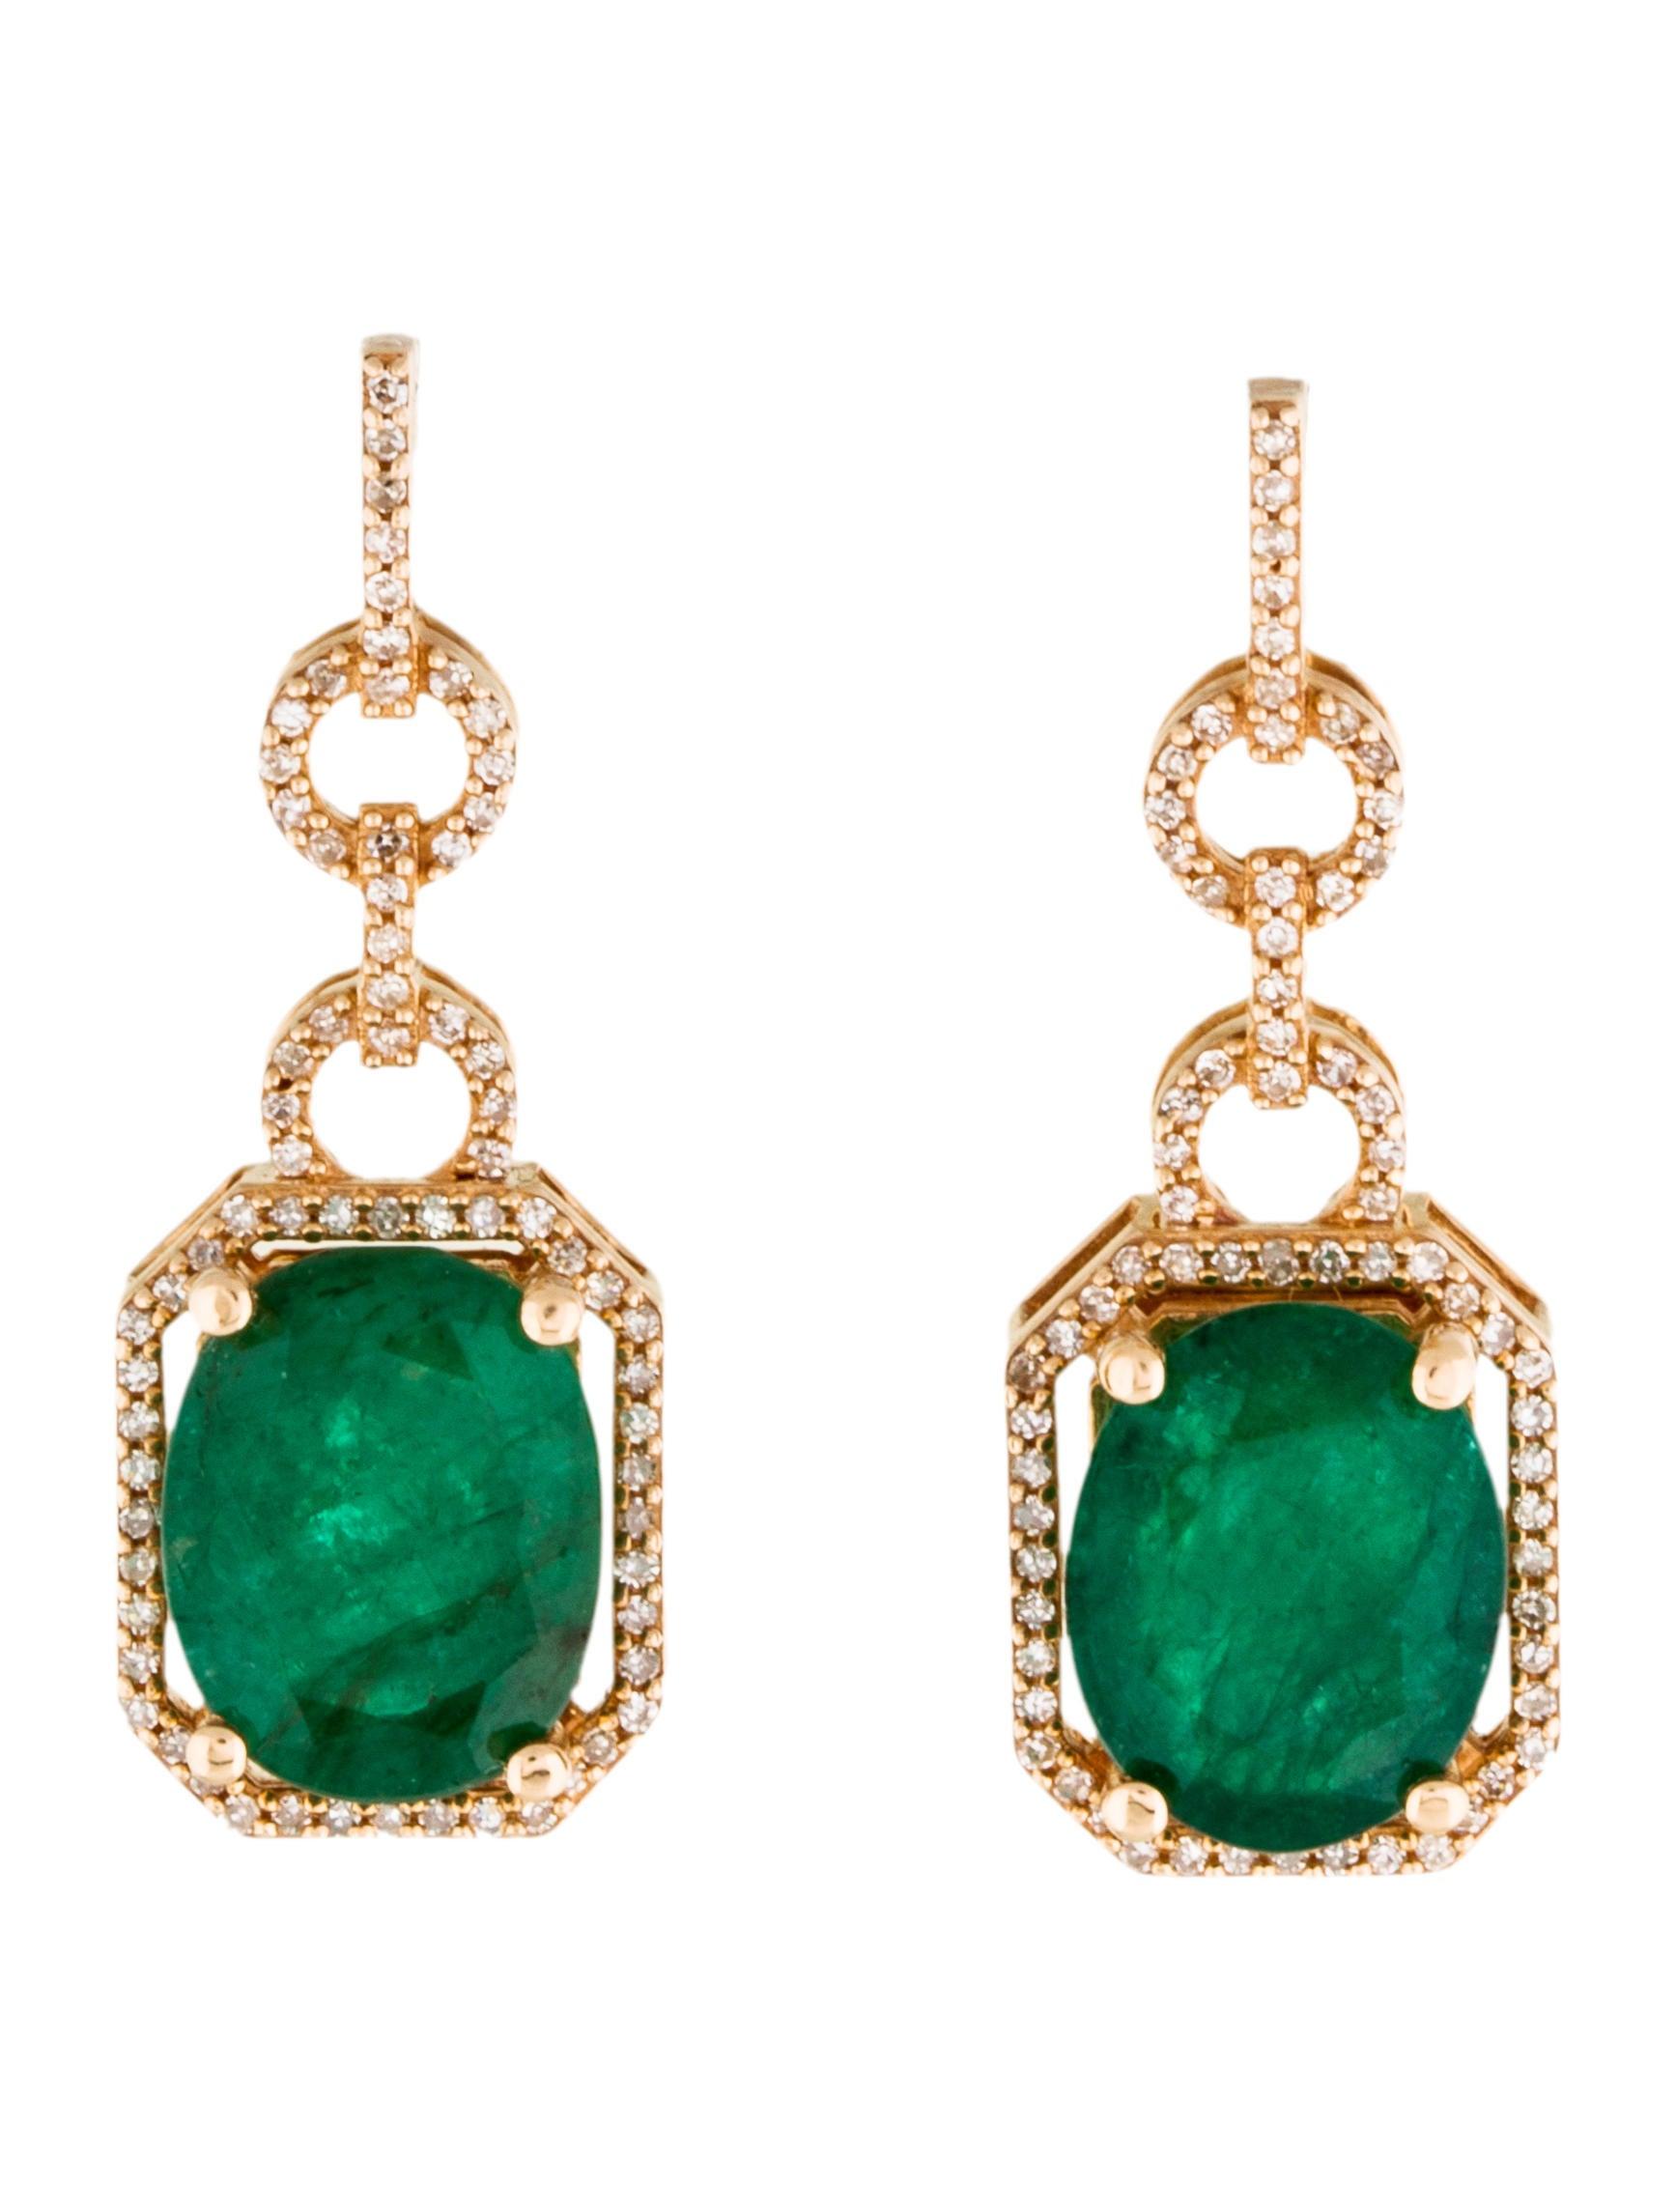 14k emerald diamond drop earrings earrings. Black Bedroom Furniture Sets. Home Design Ideas